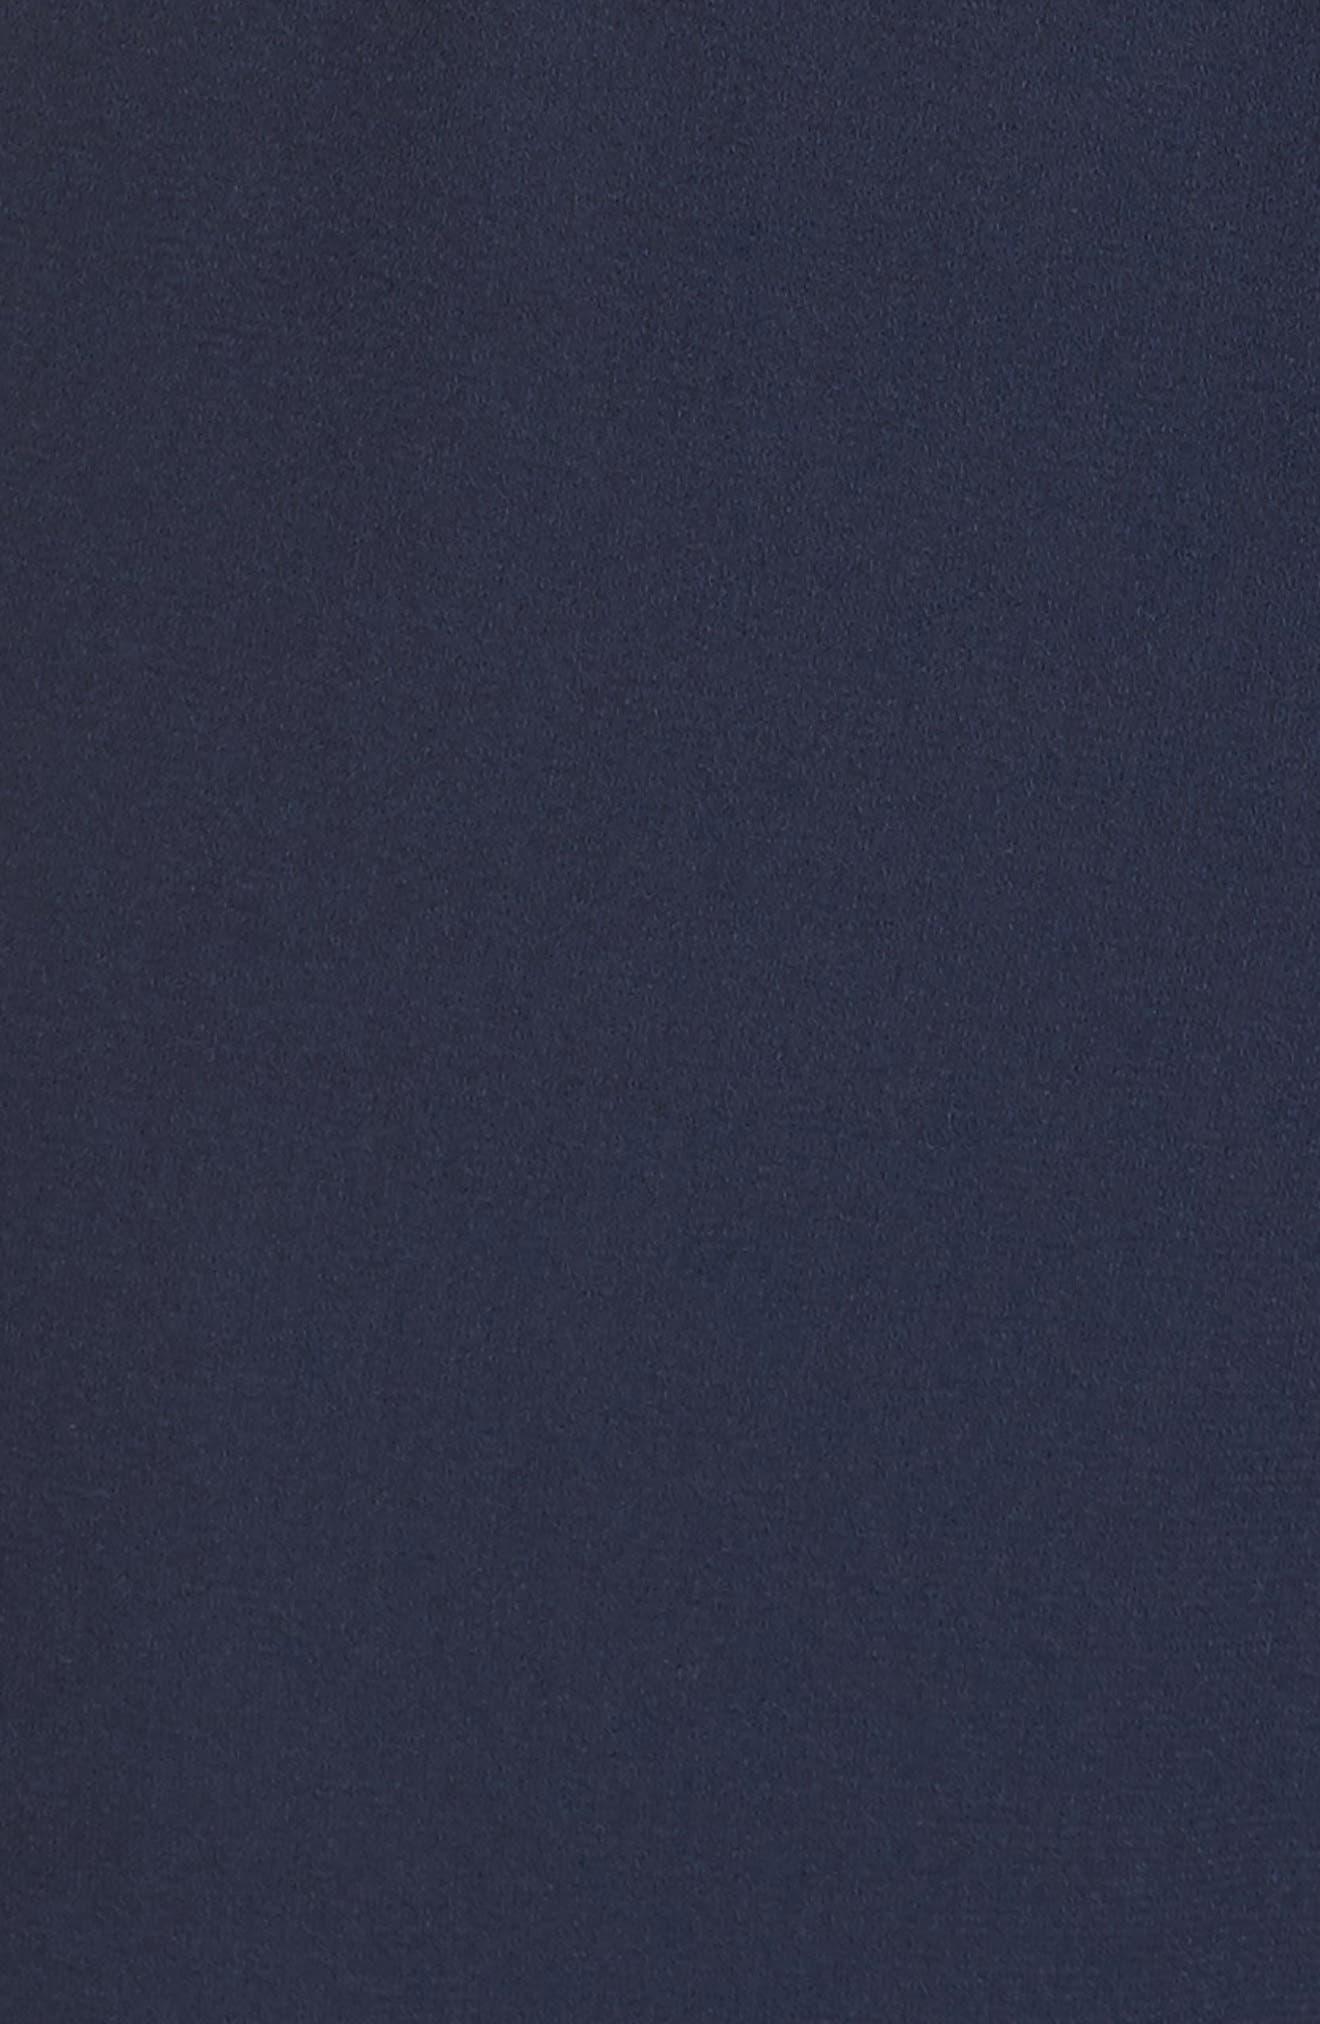 Ruffle Off the Shoulder Jumpsuit,                             Alternate thumbnail 5, color,                             410